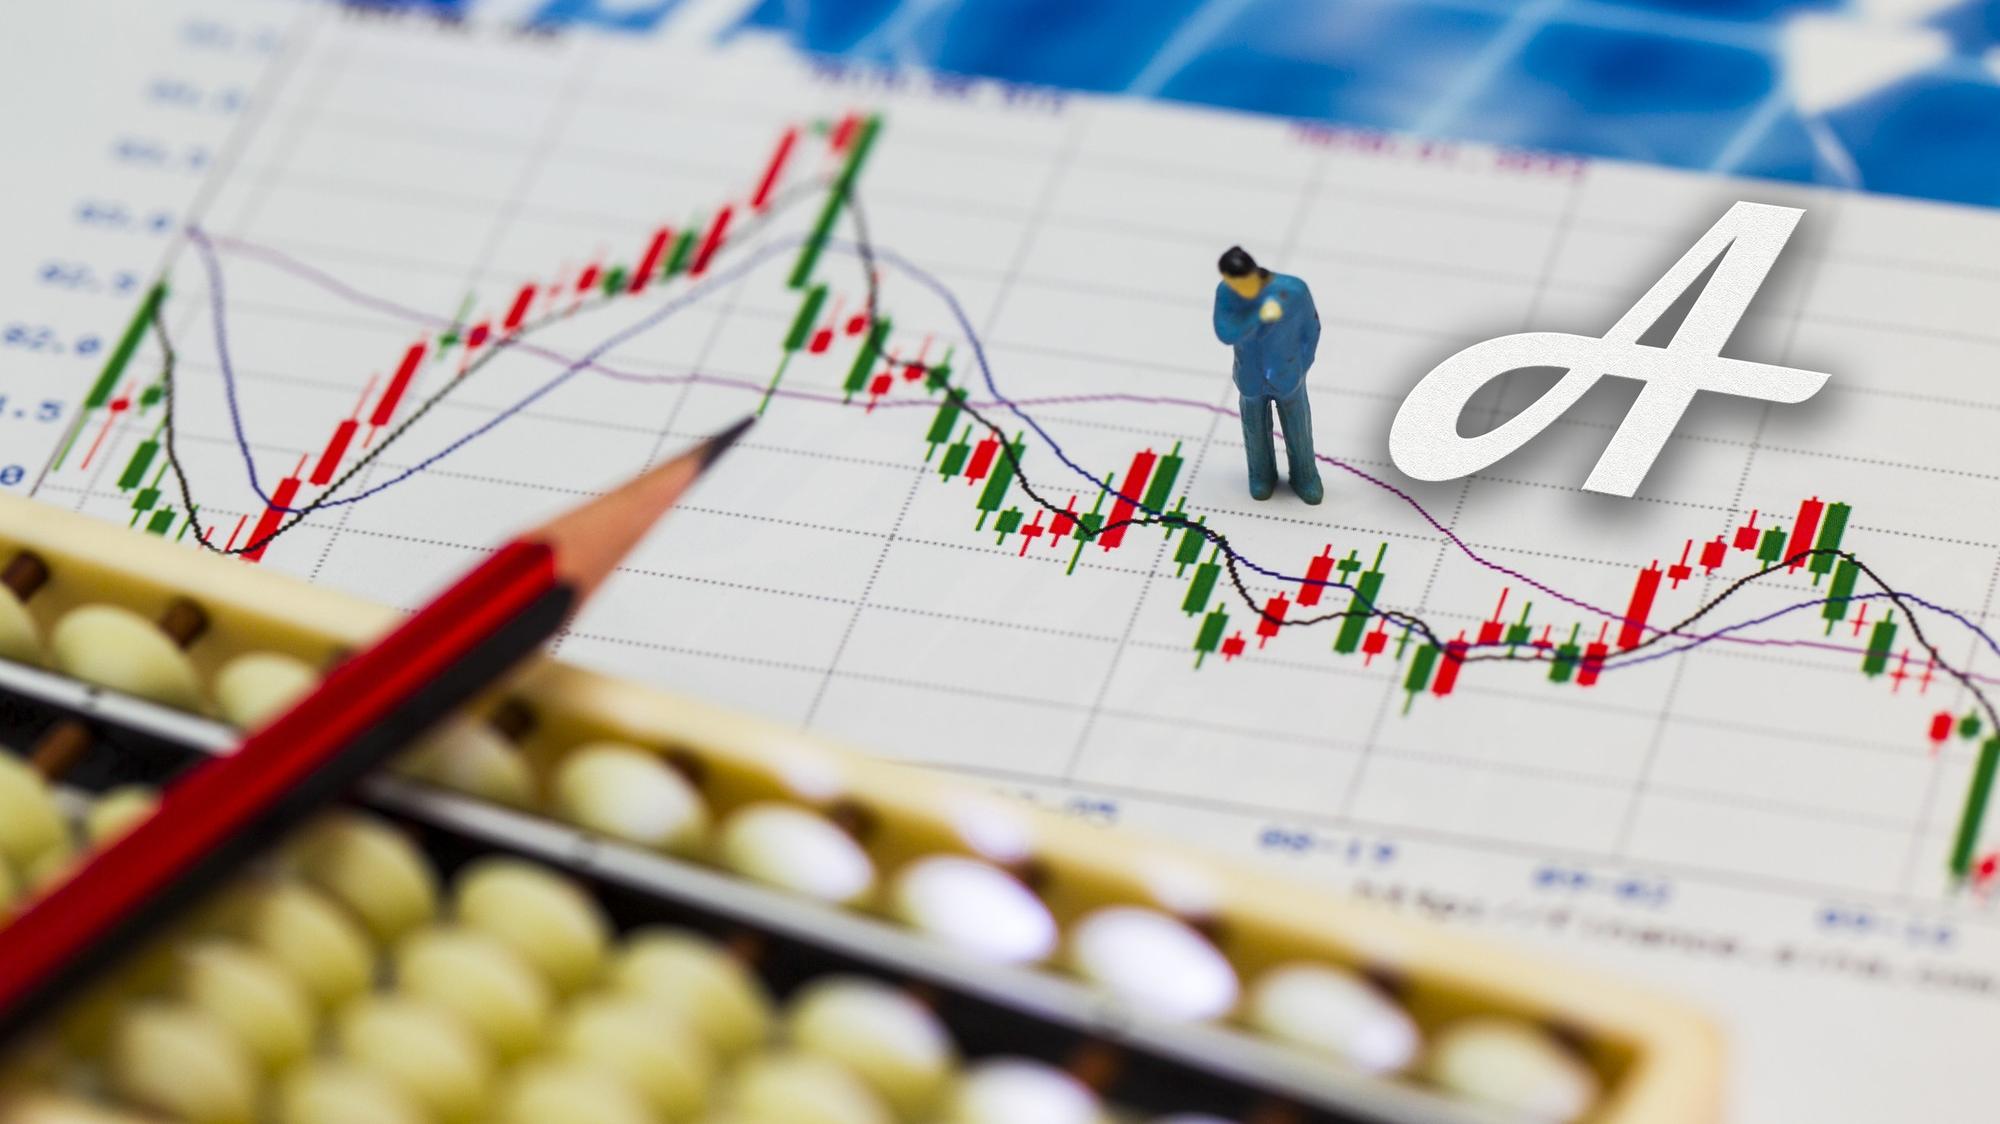 A股本轮上涨不是资金杠杆而是信息杠杆